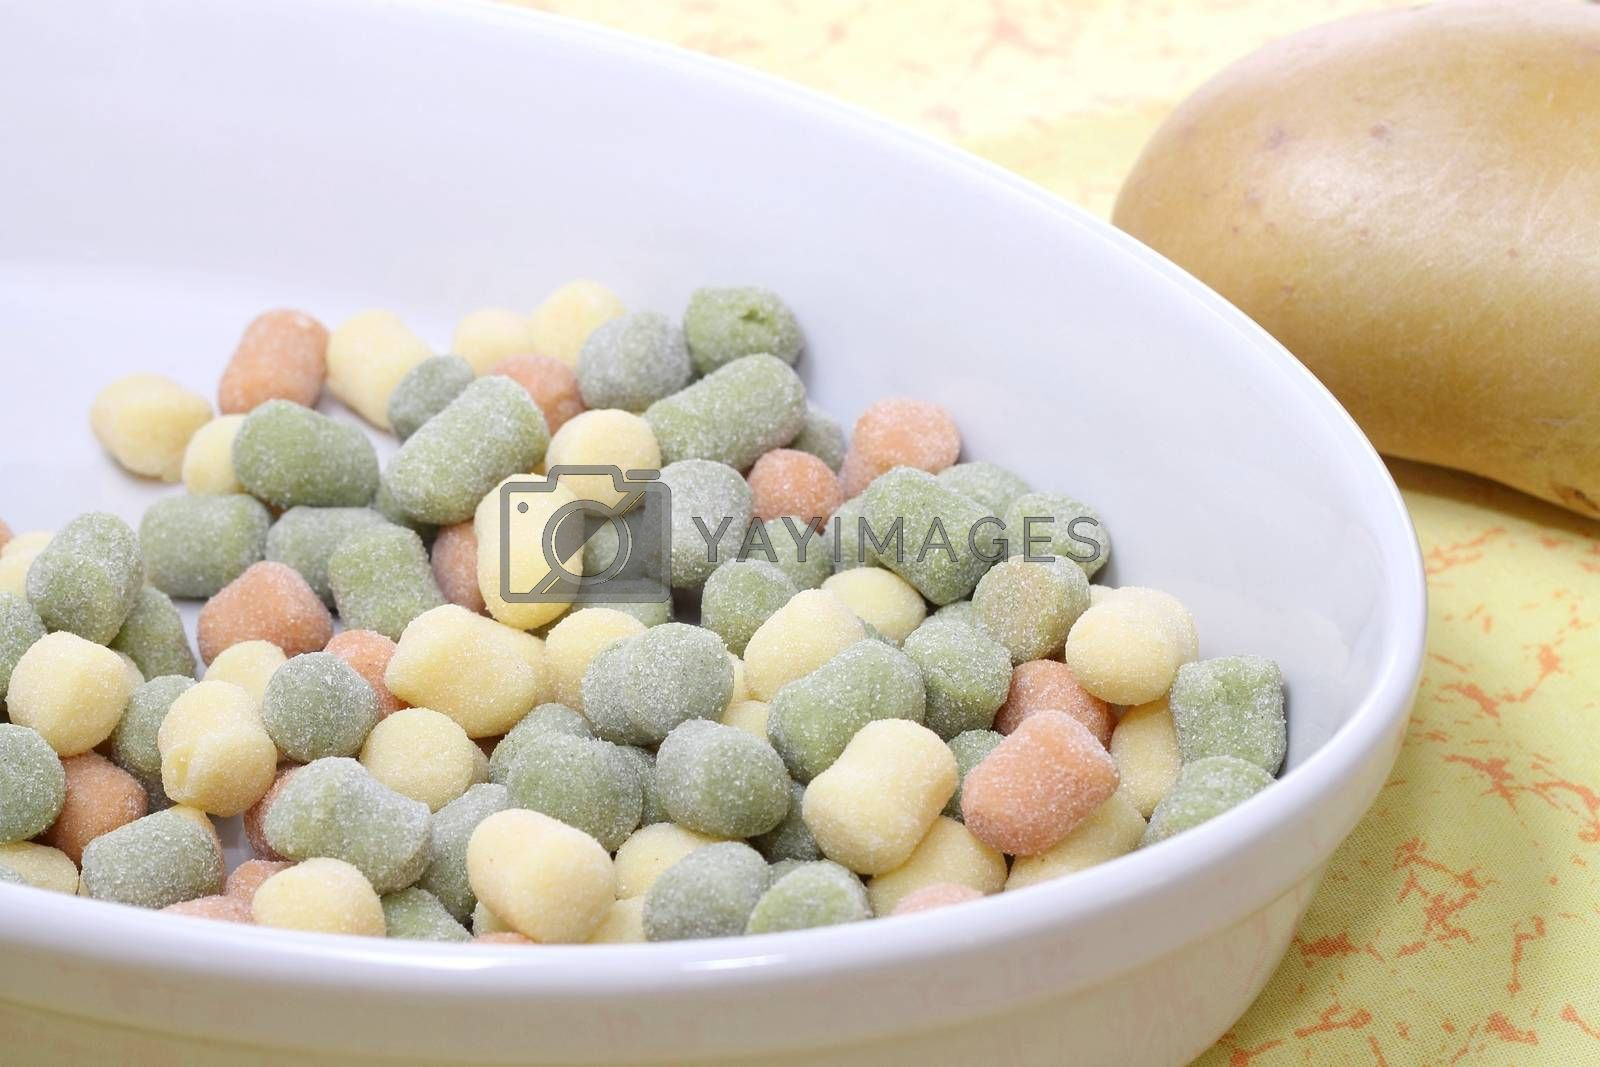 Italian gnocchi with basil leaves and potato